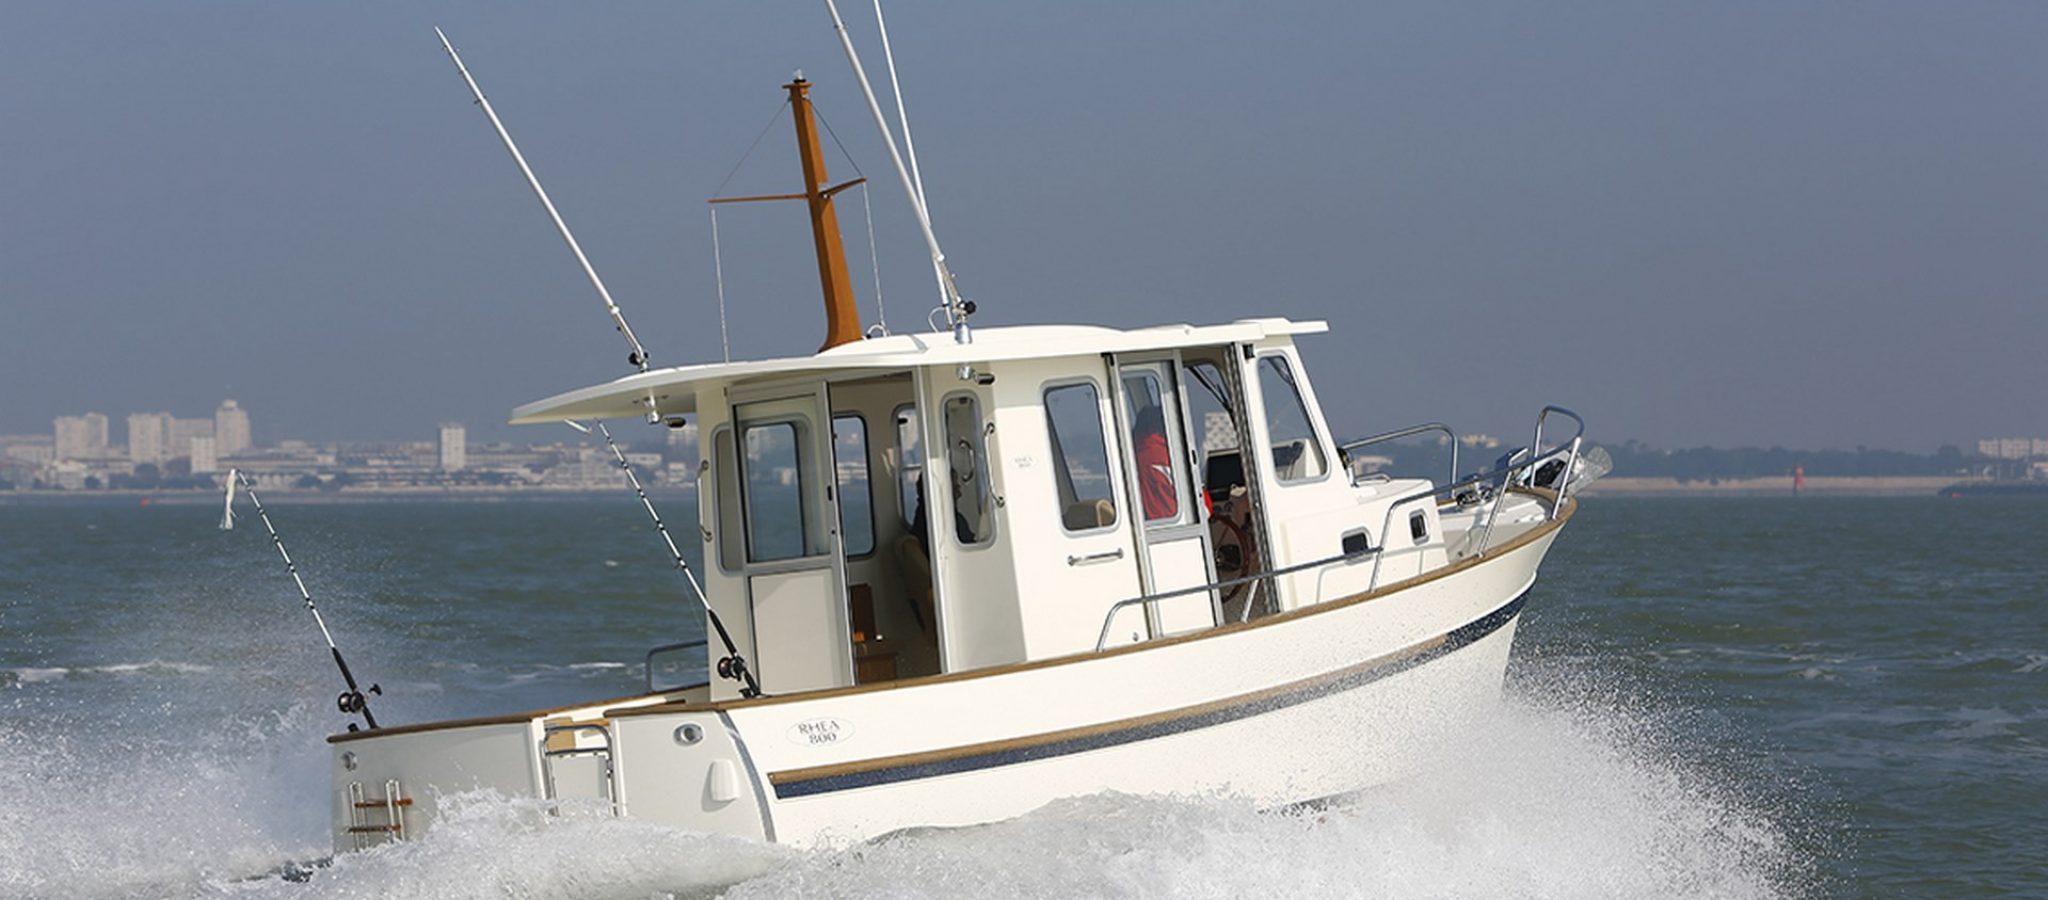 Rhéa-marine-800timonier (21)web